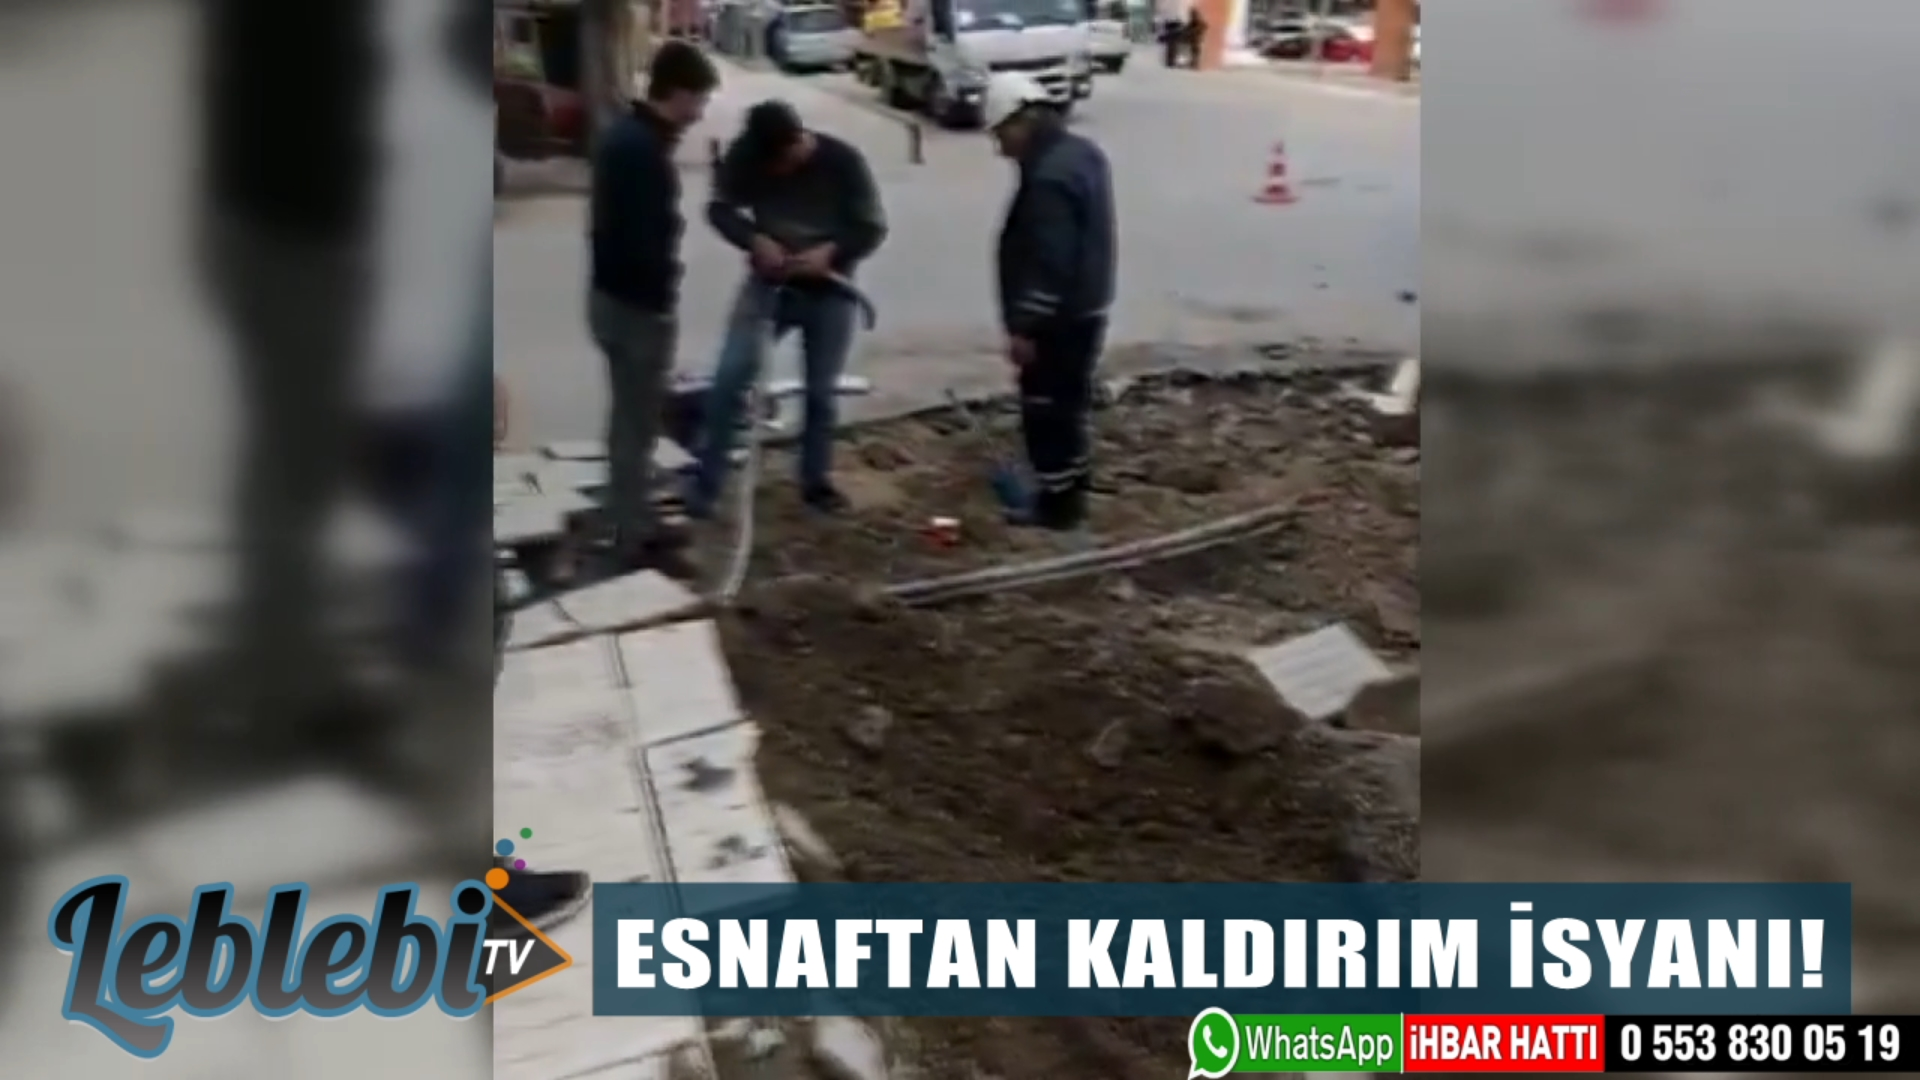 ESNAFTAN KALDIRIM İSYANI!